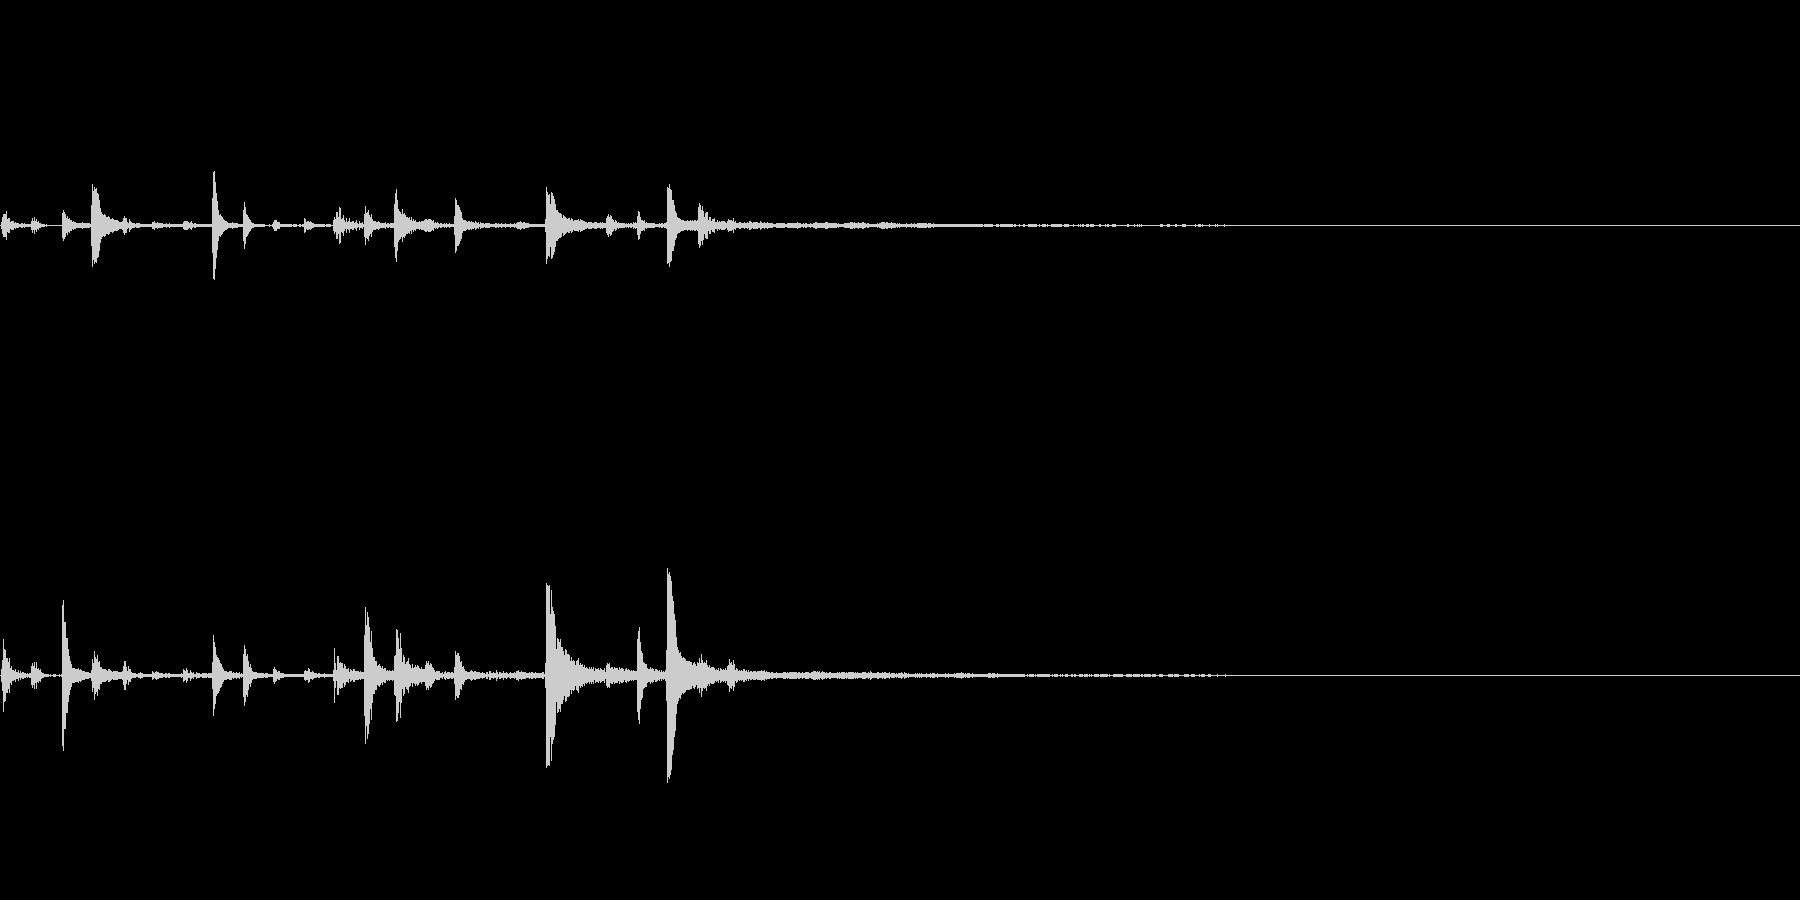 【SE 効果音】機会的なノイズ4の未再生の波形